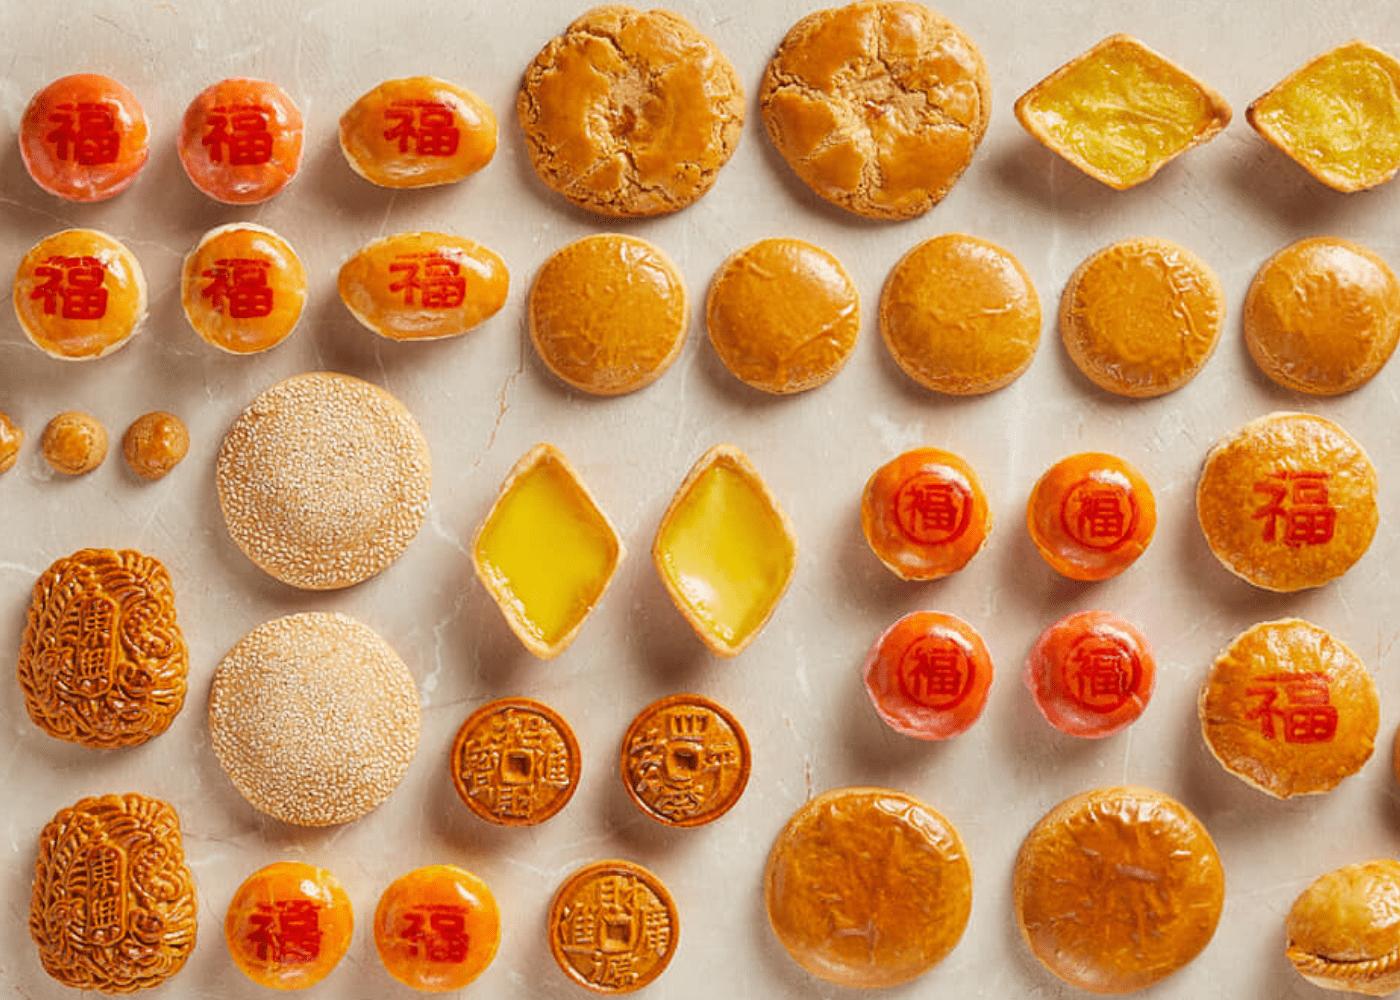 tong heng | old school bakeries